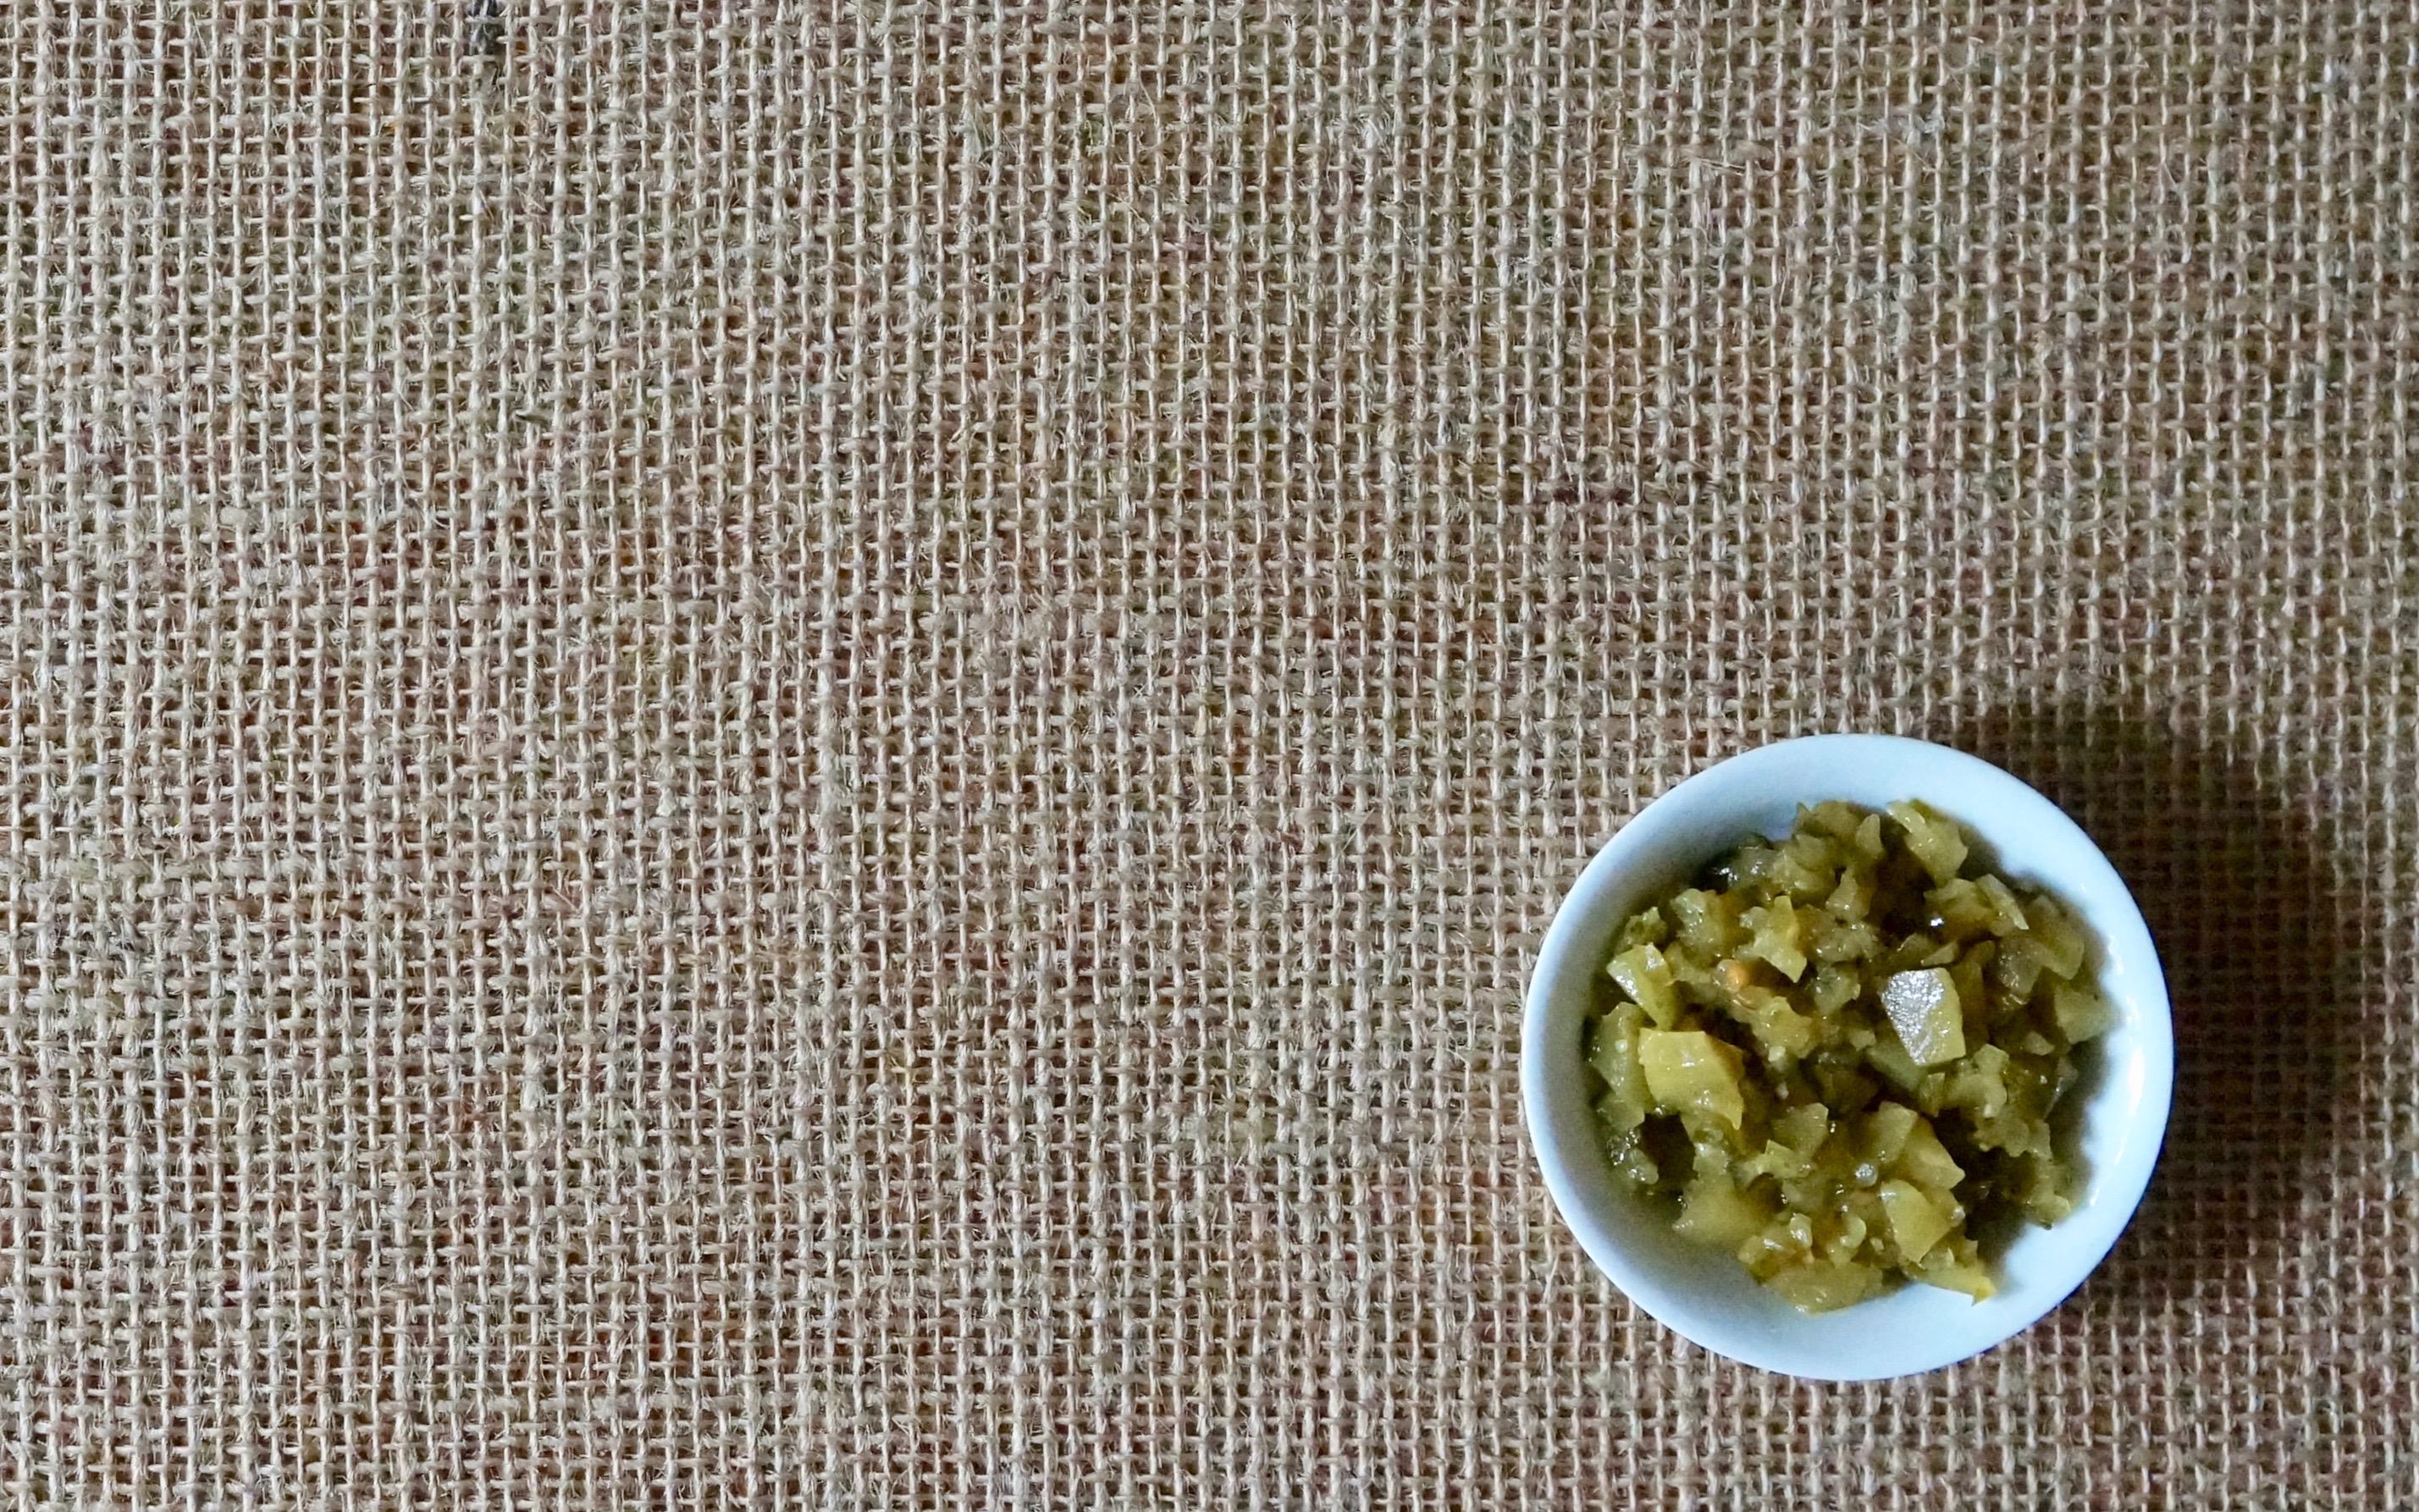 Sweet Pickle Relish Rebecca Gordon Publisher Buttermilk Lipstick Culinary Entertaining Technique Southern Hostess-Potato-Salad-RebeccaGordon-Pastry-Chef-Birmingham-Alabama